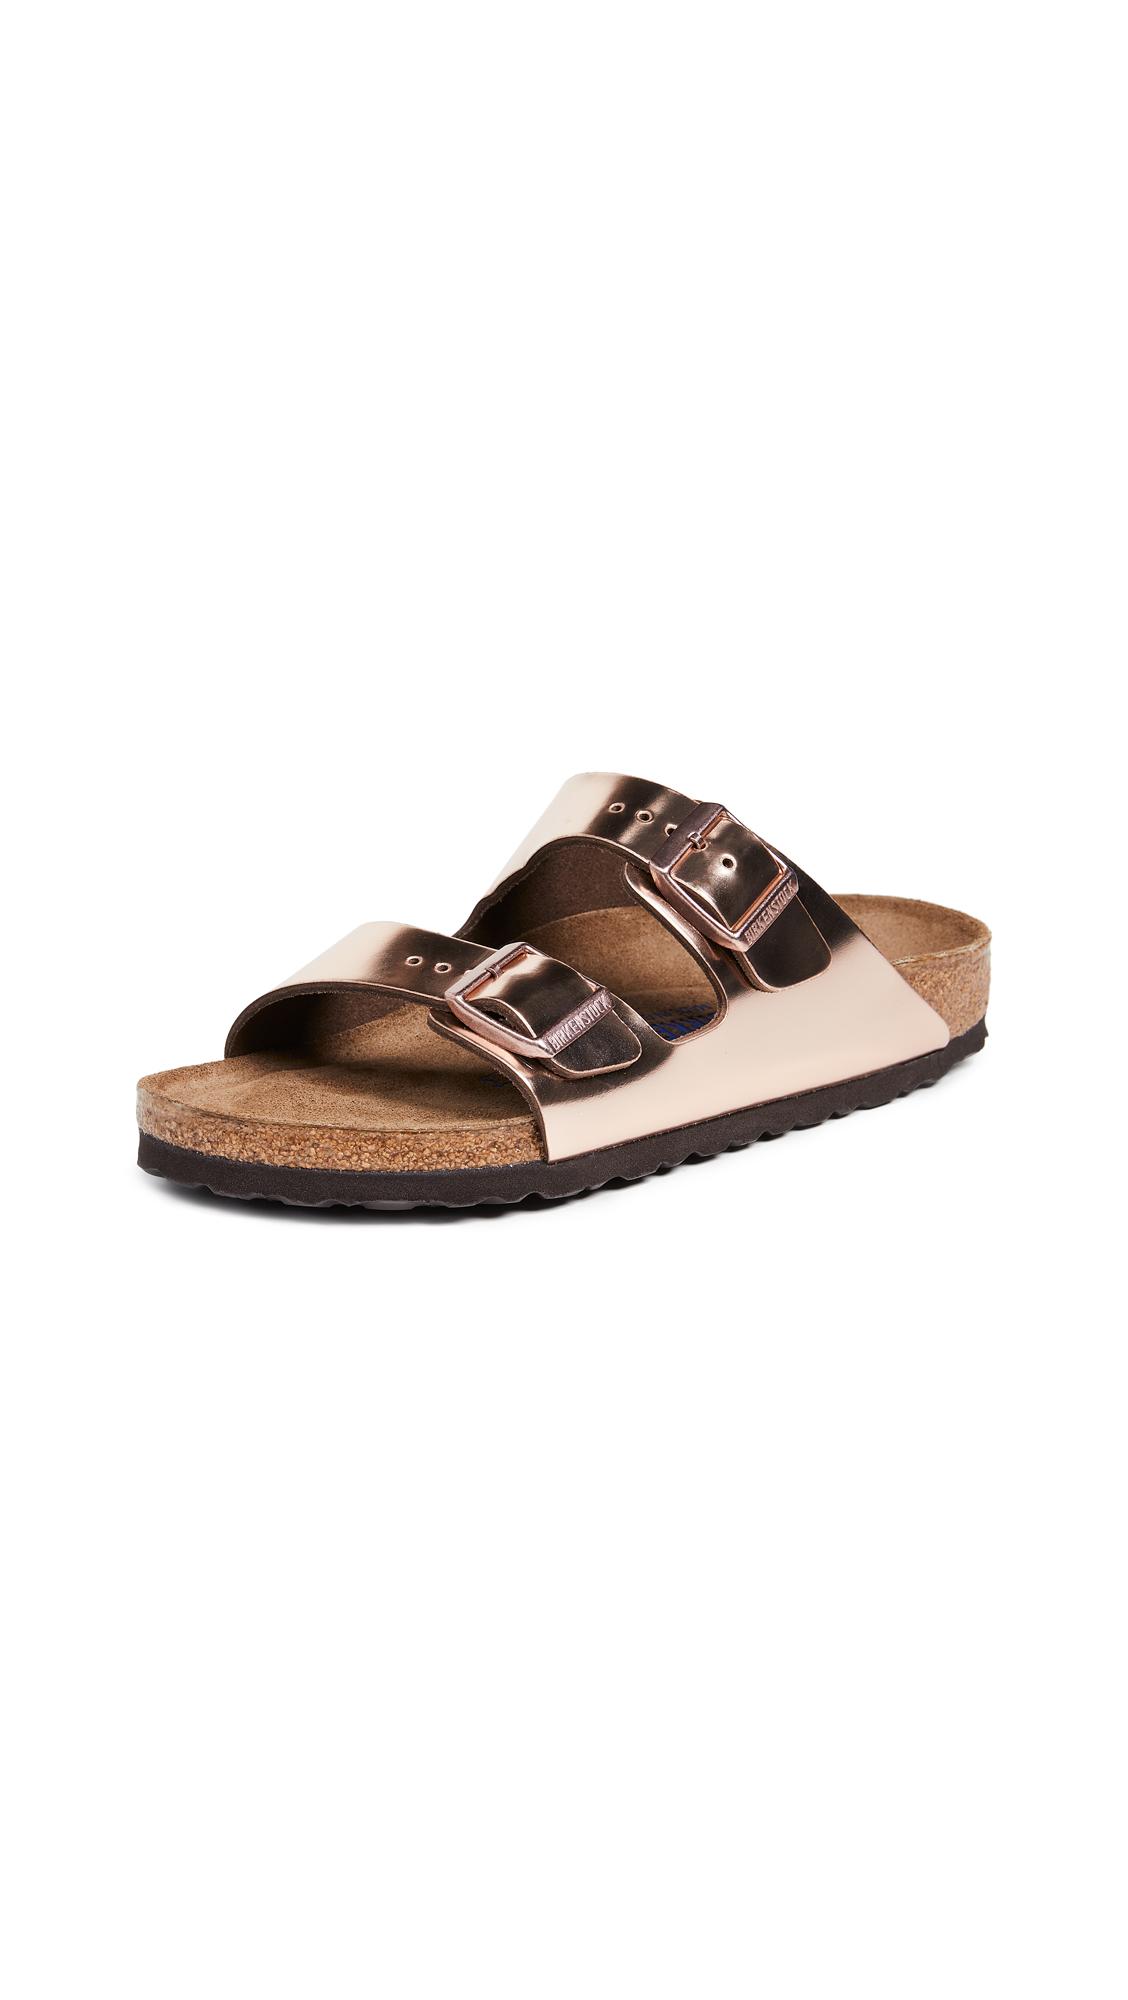 Birkenstock Arizona SFB Sandals - Metallic Copper